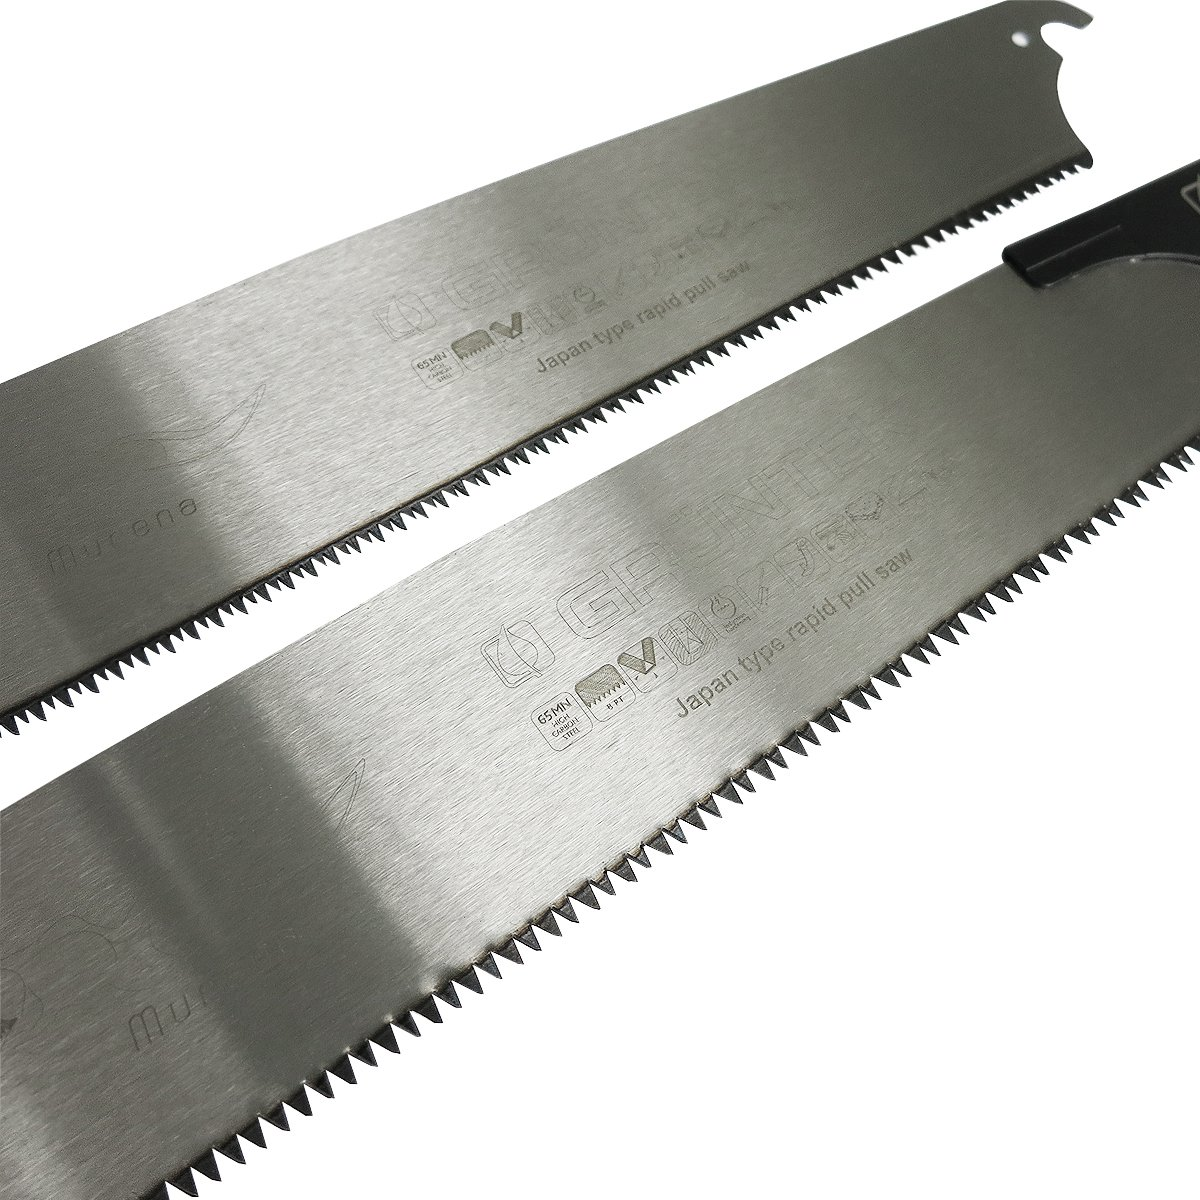 sierra de jard/ín sierra de mano sierra tronzadora para corte fino y grueso 300/mm con 2/hojas Murena Sierra japonesa